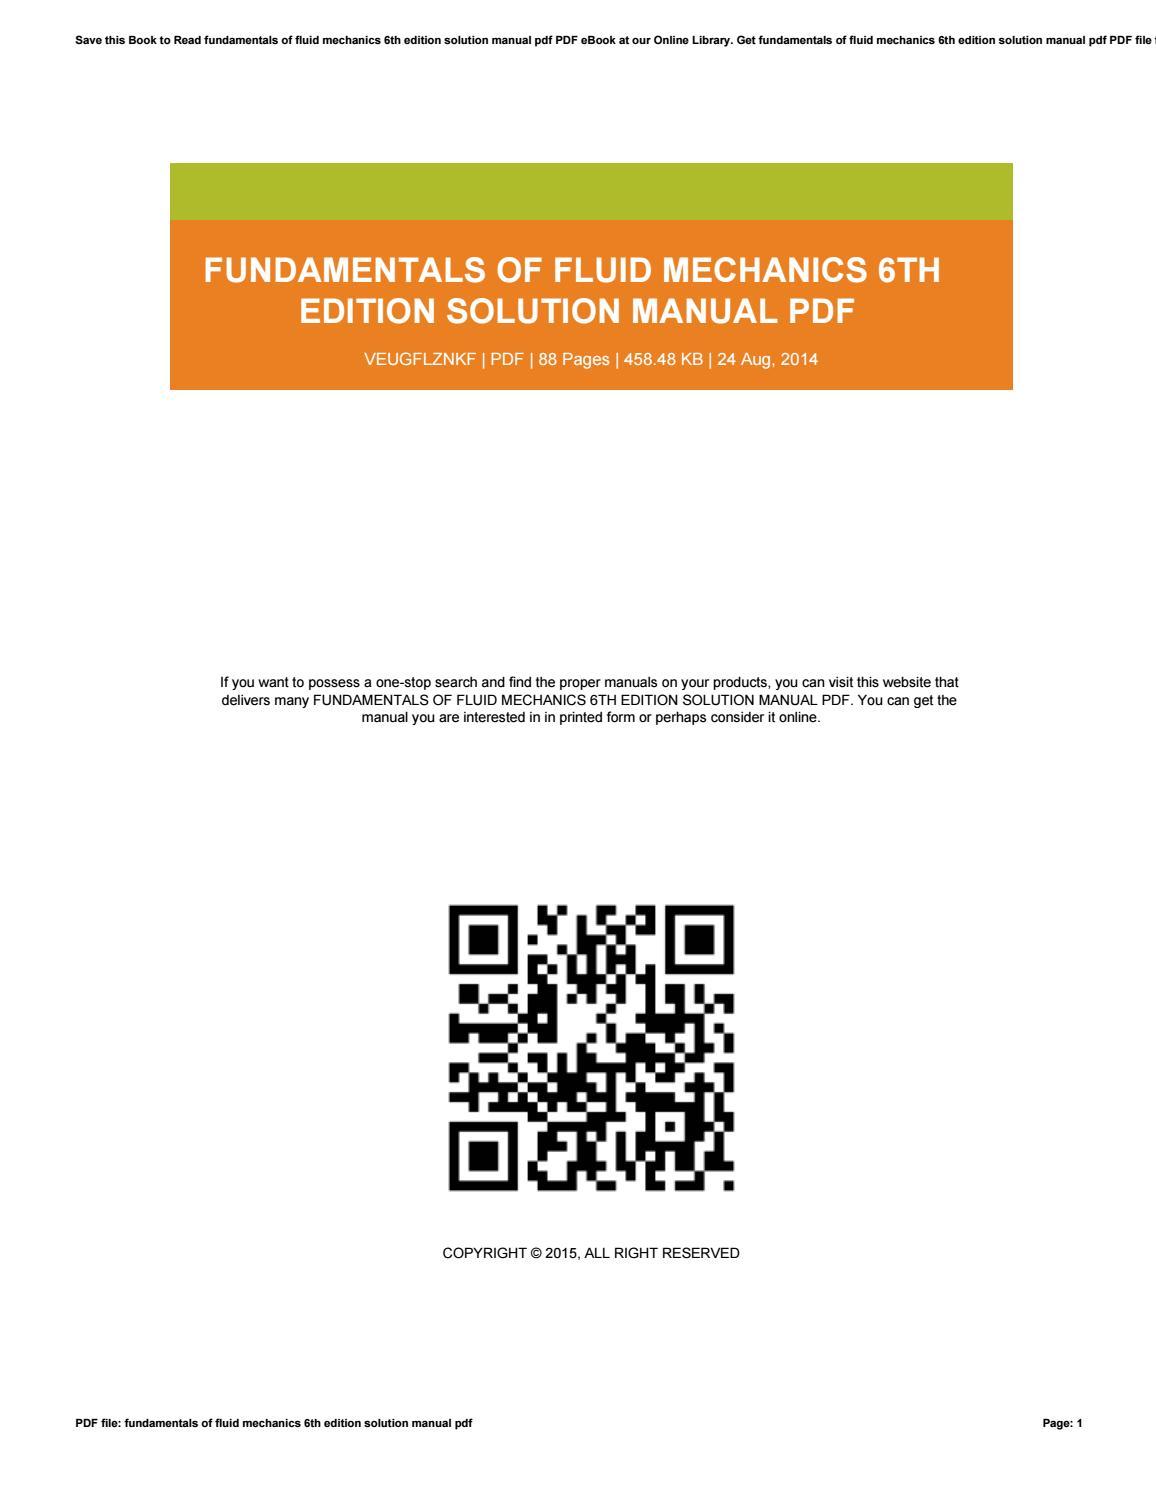 Fundamentals of fluid mechanics 6th edition solution manual pdf fundamentals of fluid mechanics 6th edition solution manual pdf fundamentals of fluid mechanics by munson fandeluxe Images